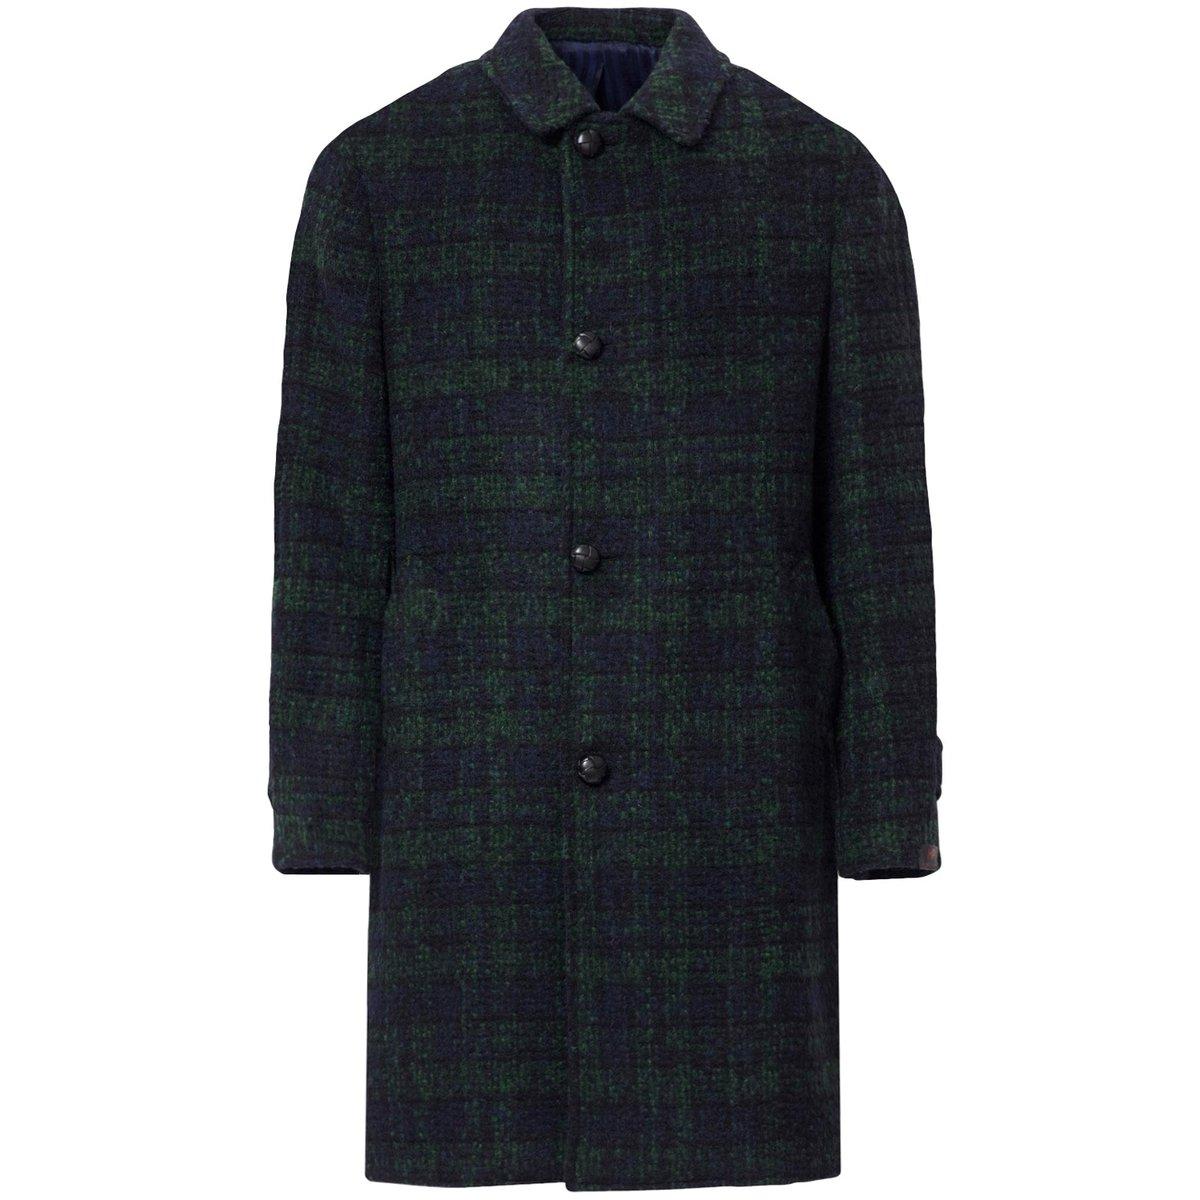 mp-massimo-piombo-Green-checked-Checked-Wool-Coat.jpg